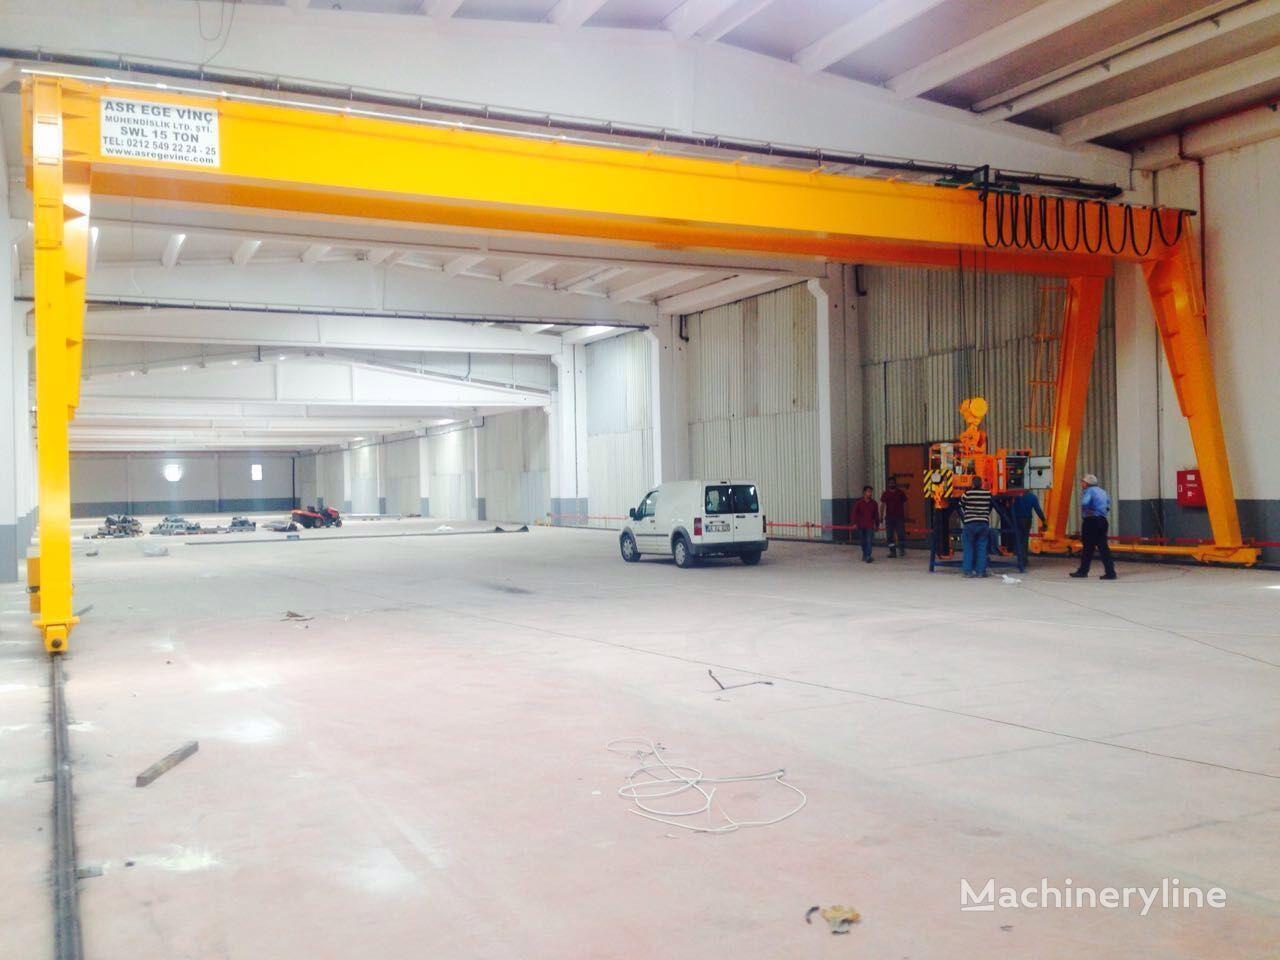 new ASR VİNÇ Gantry Crane ,  Kozlovoy kran , رافعة جسرية , portal krani gantry crane